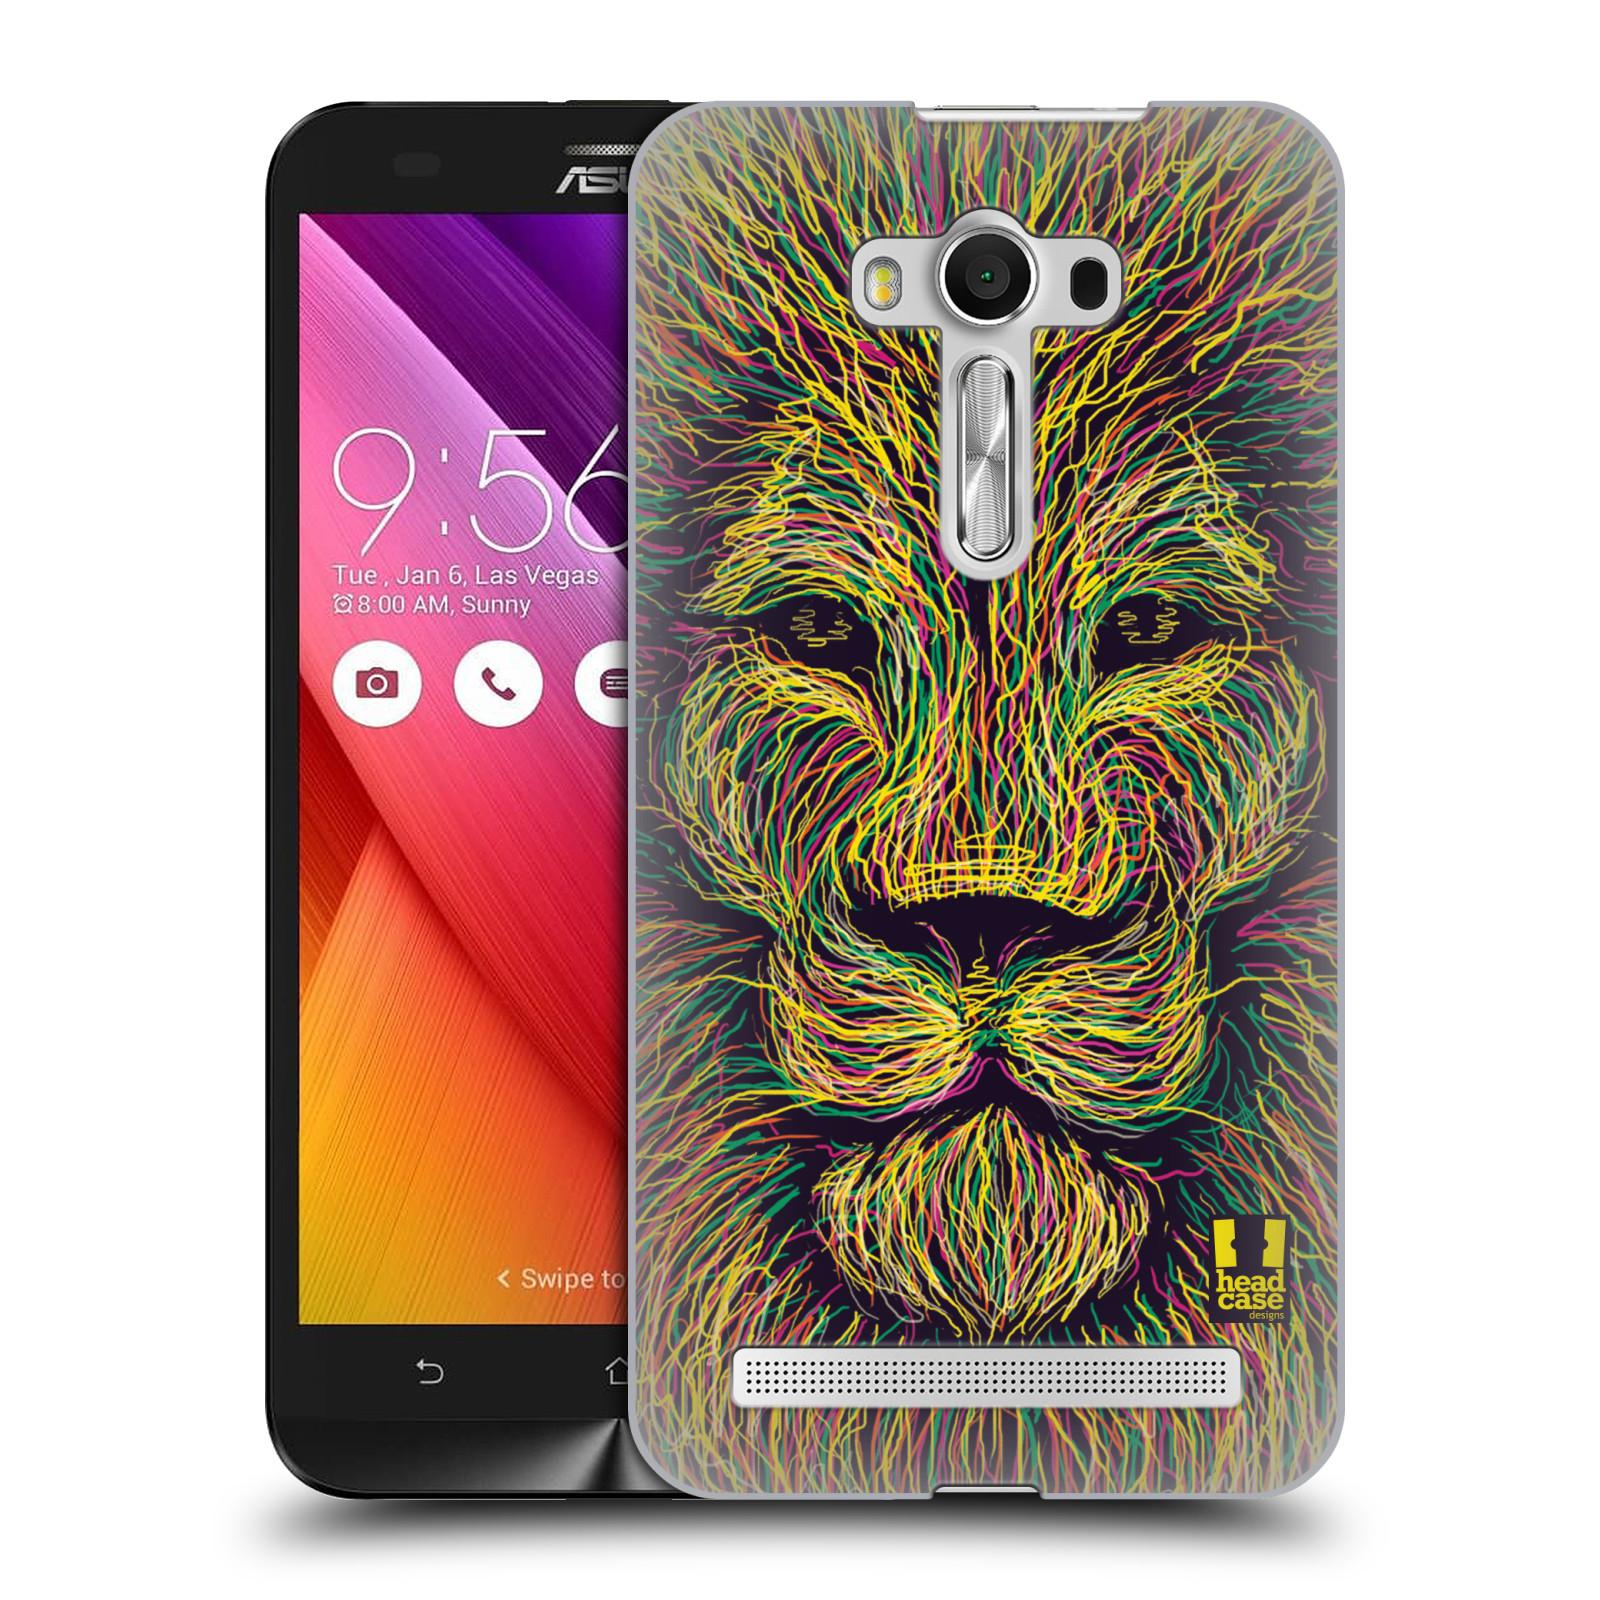 HEAD CASE plastový obal na mobil Asus Zenfone 2 LASER (5,5 displej ZE550KL) vzor zvíře čmáranice lev